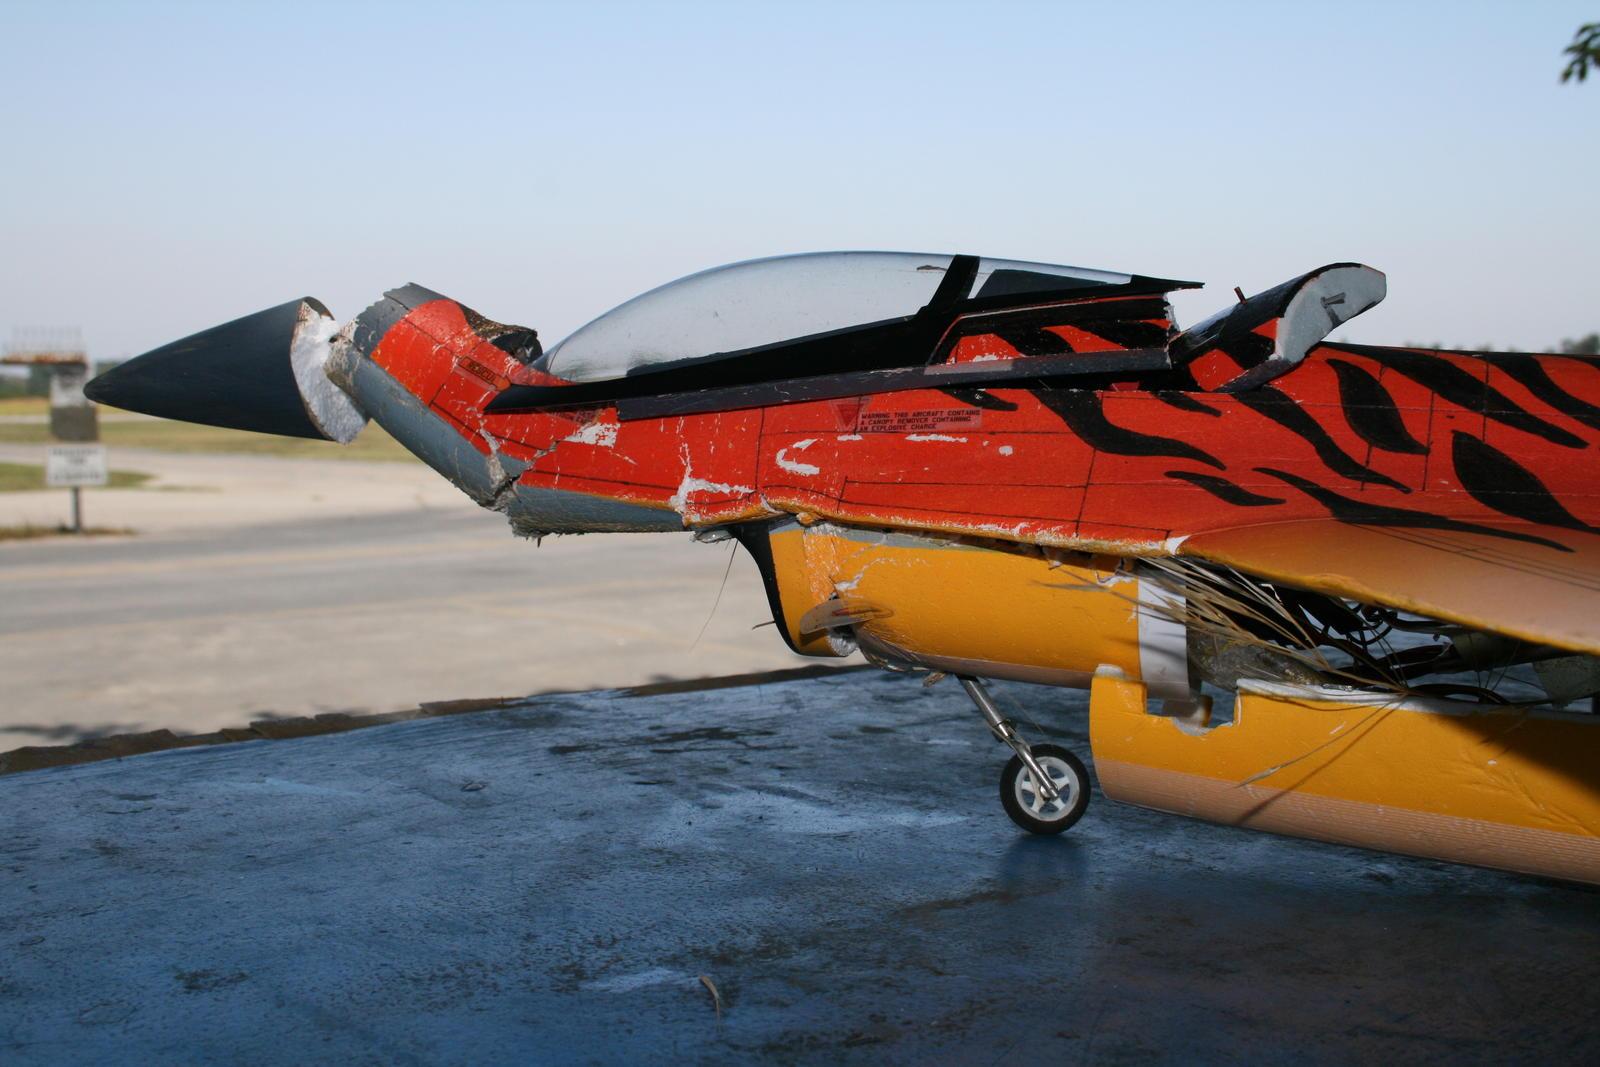 Lowflying plane prompts crash search near Whitetail